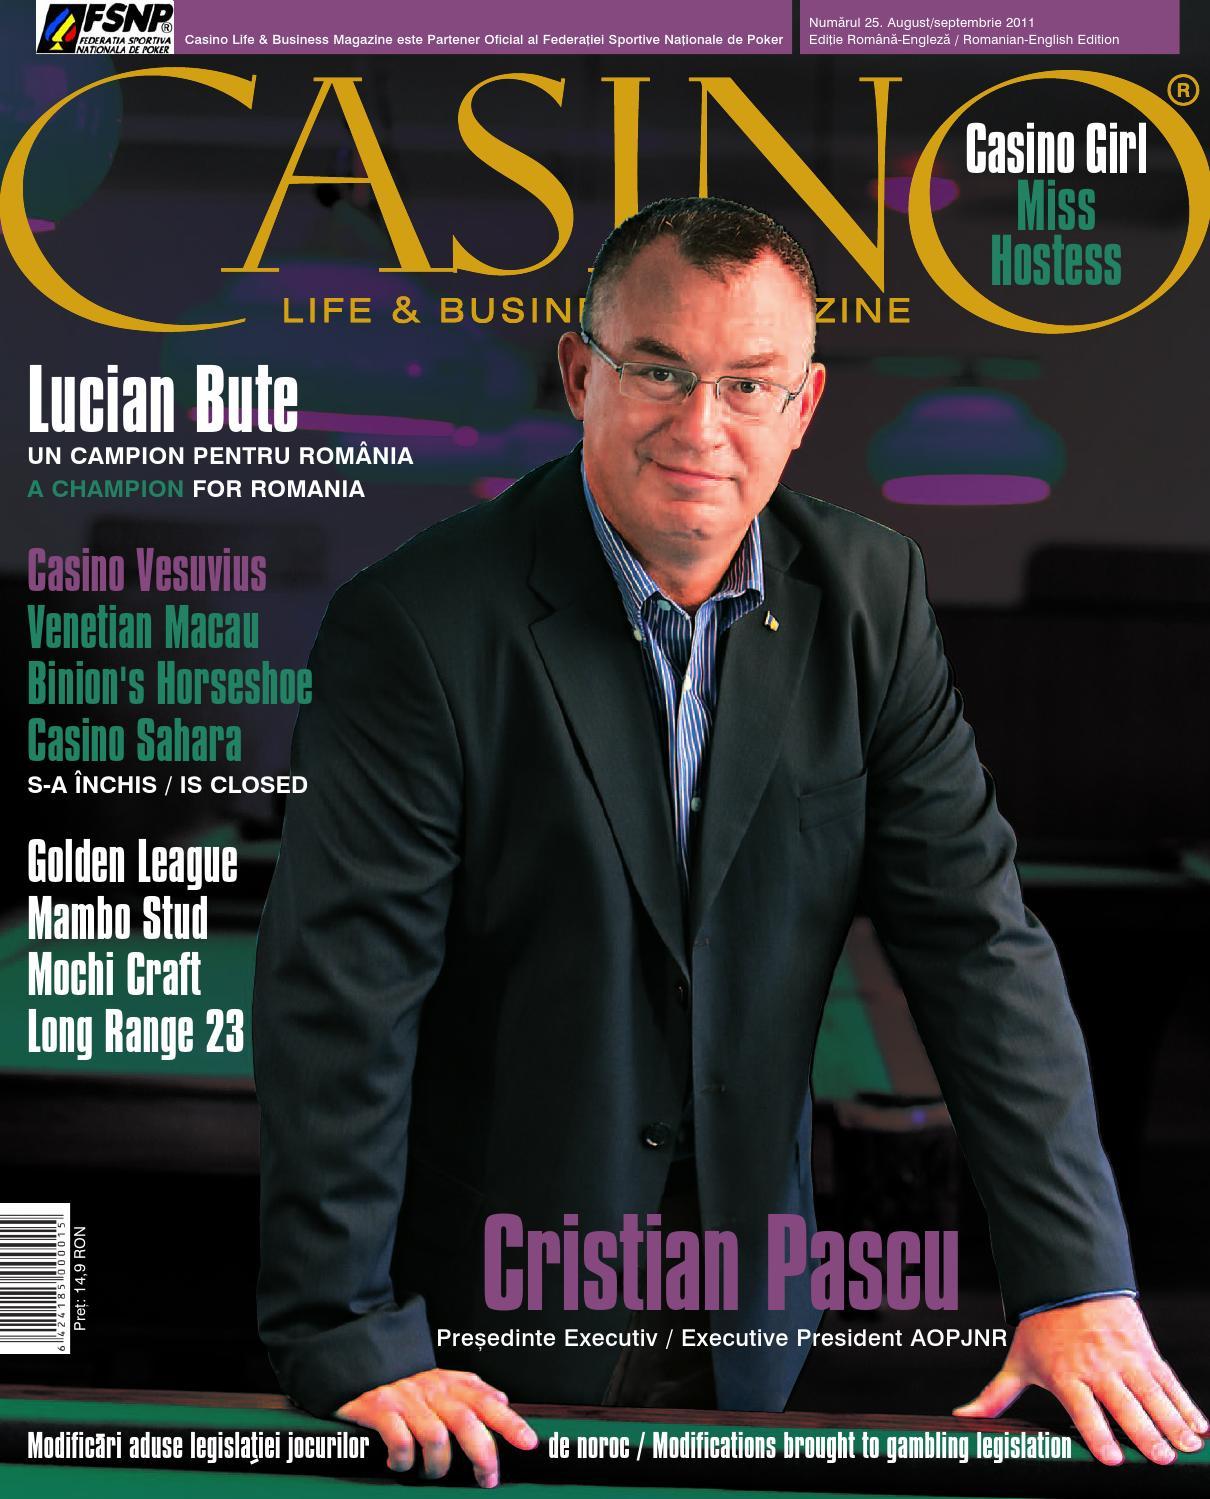 Casino Life & Business Magazine editia / edition 25 by casino life - Issuu